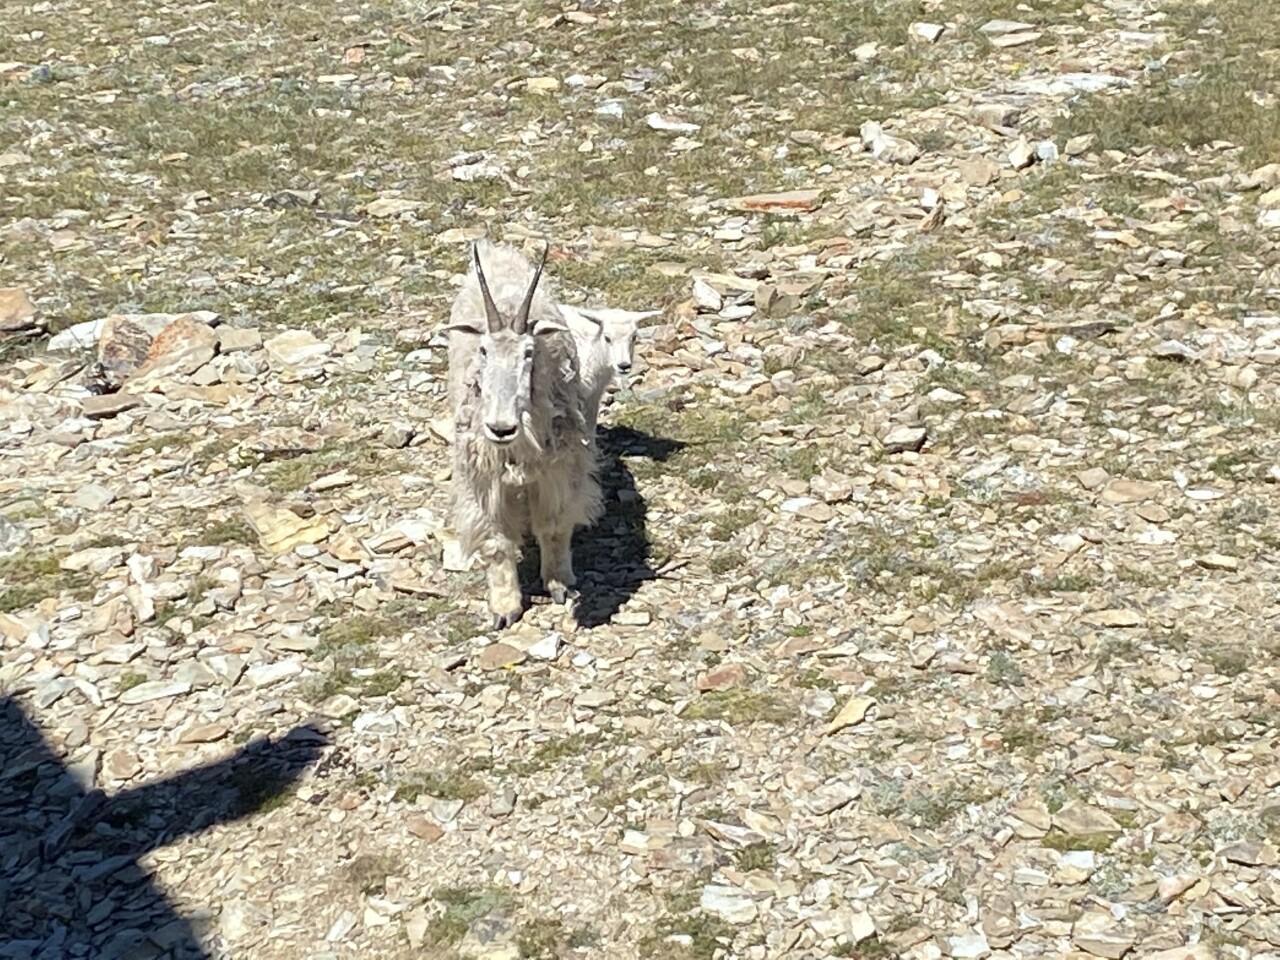 Mountain goats at Stonewall Mountain Lookout